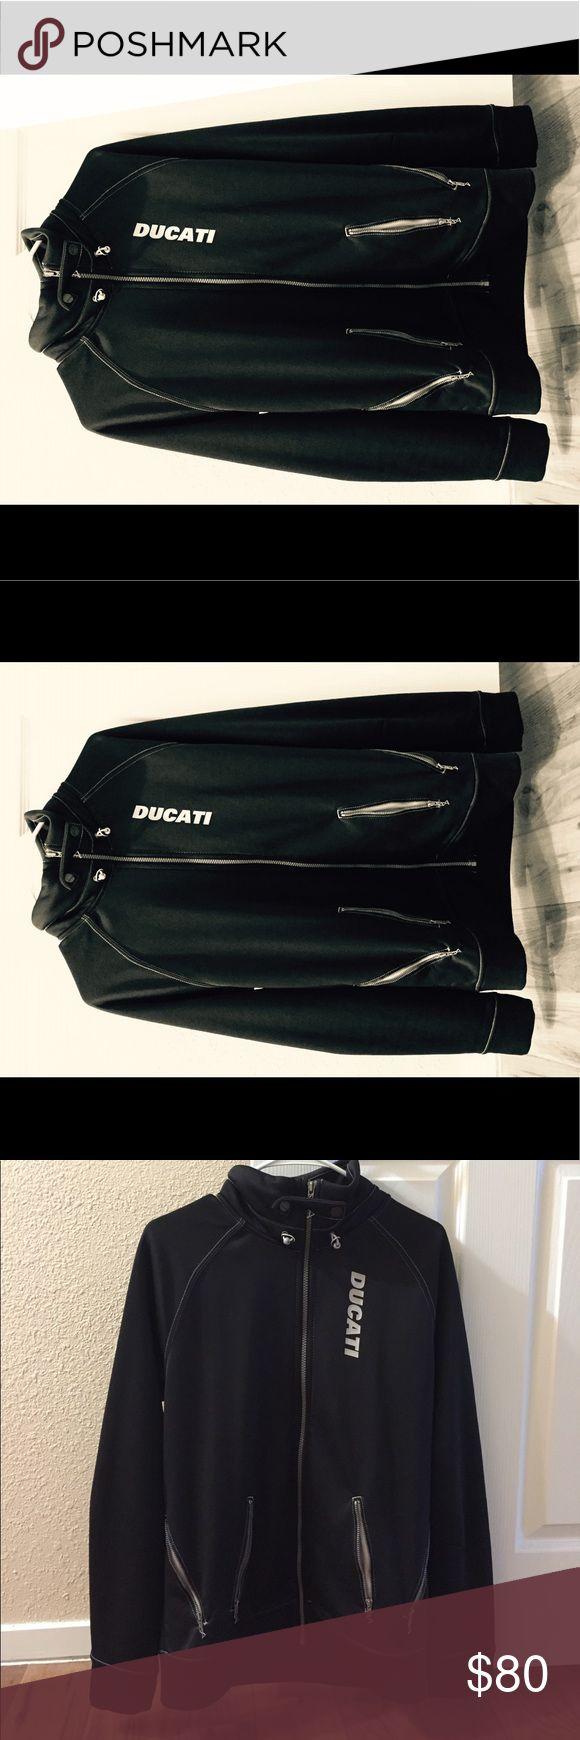 Ducati jacket (Jet Black) from Puma Original Ducati jacket with front zipper and 4 zipper pockets. Puma Jackets & Coats Performance Jackets